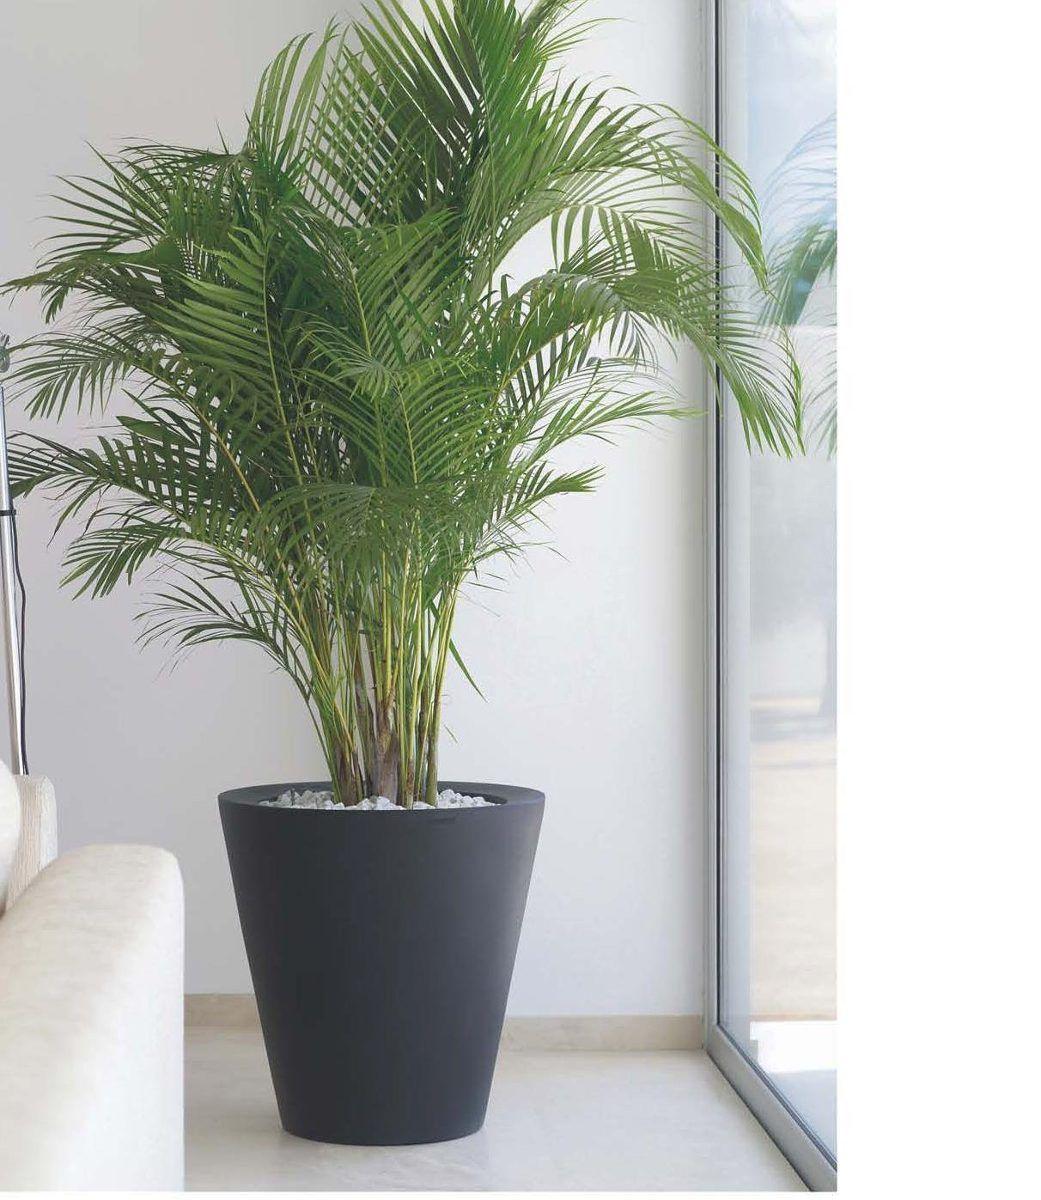 Pin by hernan menendez on plantas corner plant plants - Macetas para interiores ...